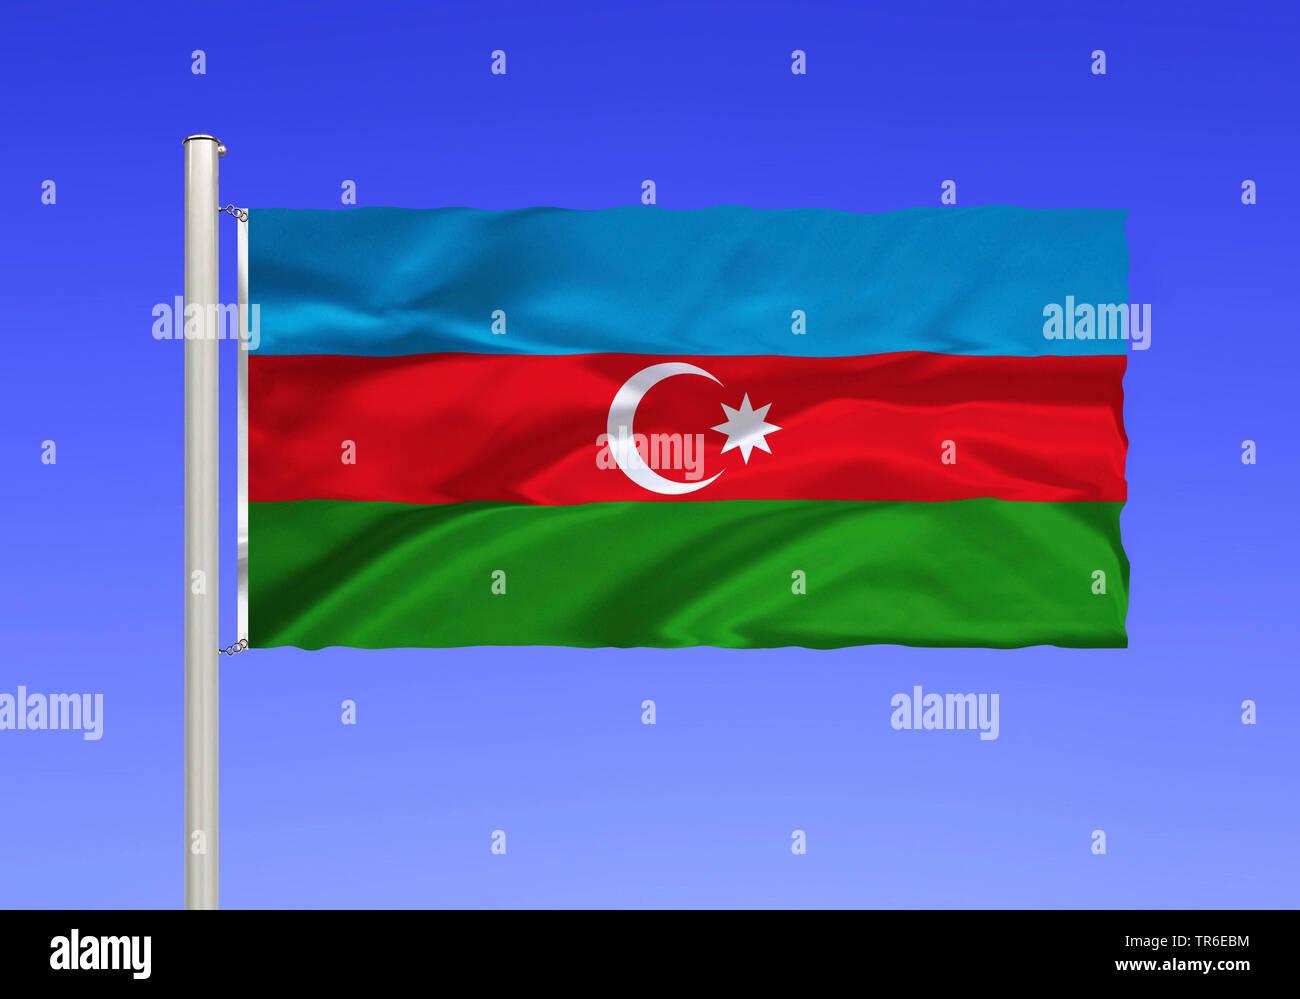 Flagge von Aserbaidschan vor blauem Himmel, Aserbaidschan | flag of Azerbaijan against blue sky, Azerbaijan | BLWS481941.jpg [ (c) blickwinkel/McPHOTO - Stock Image